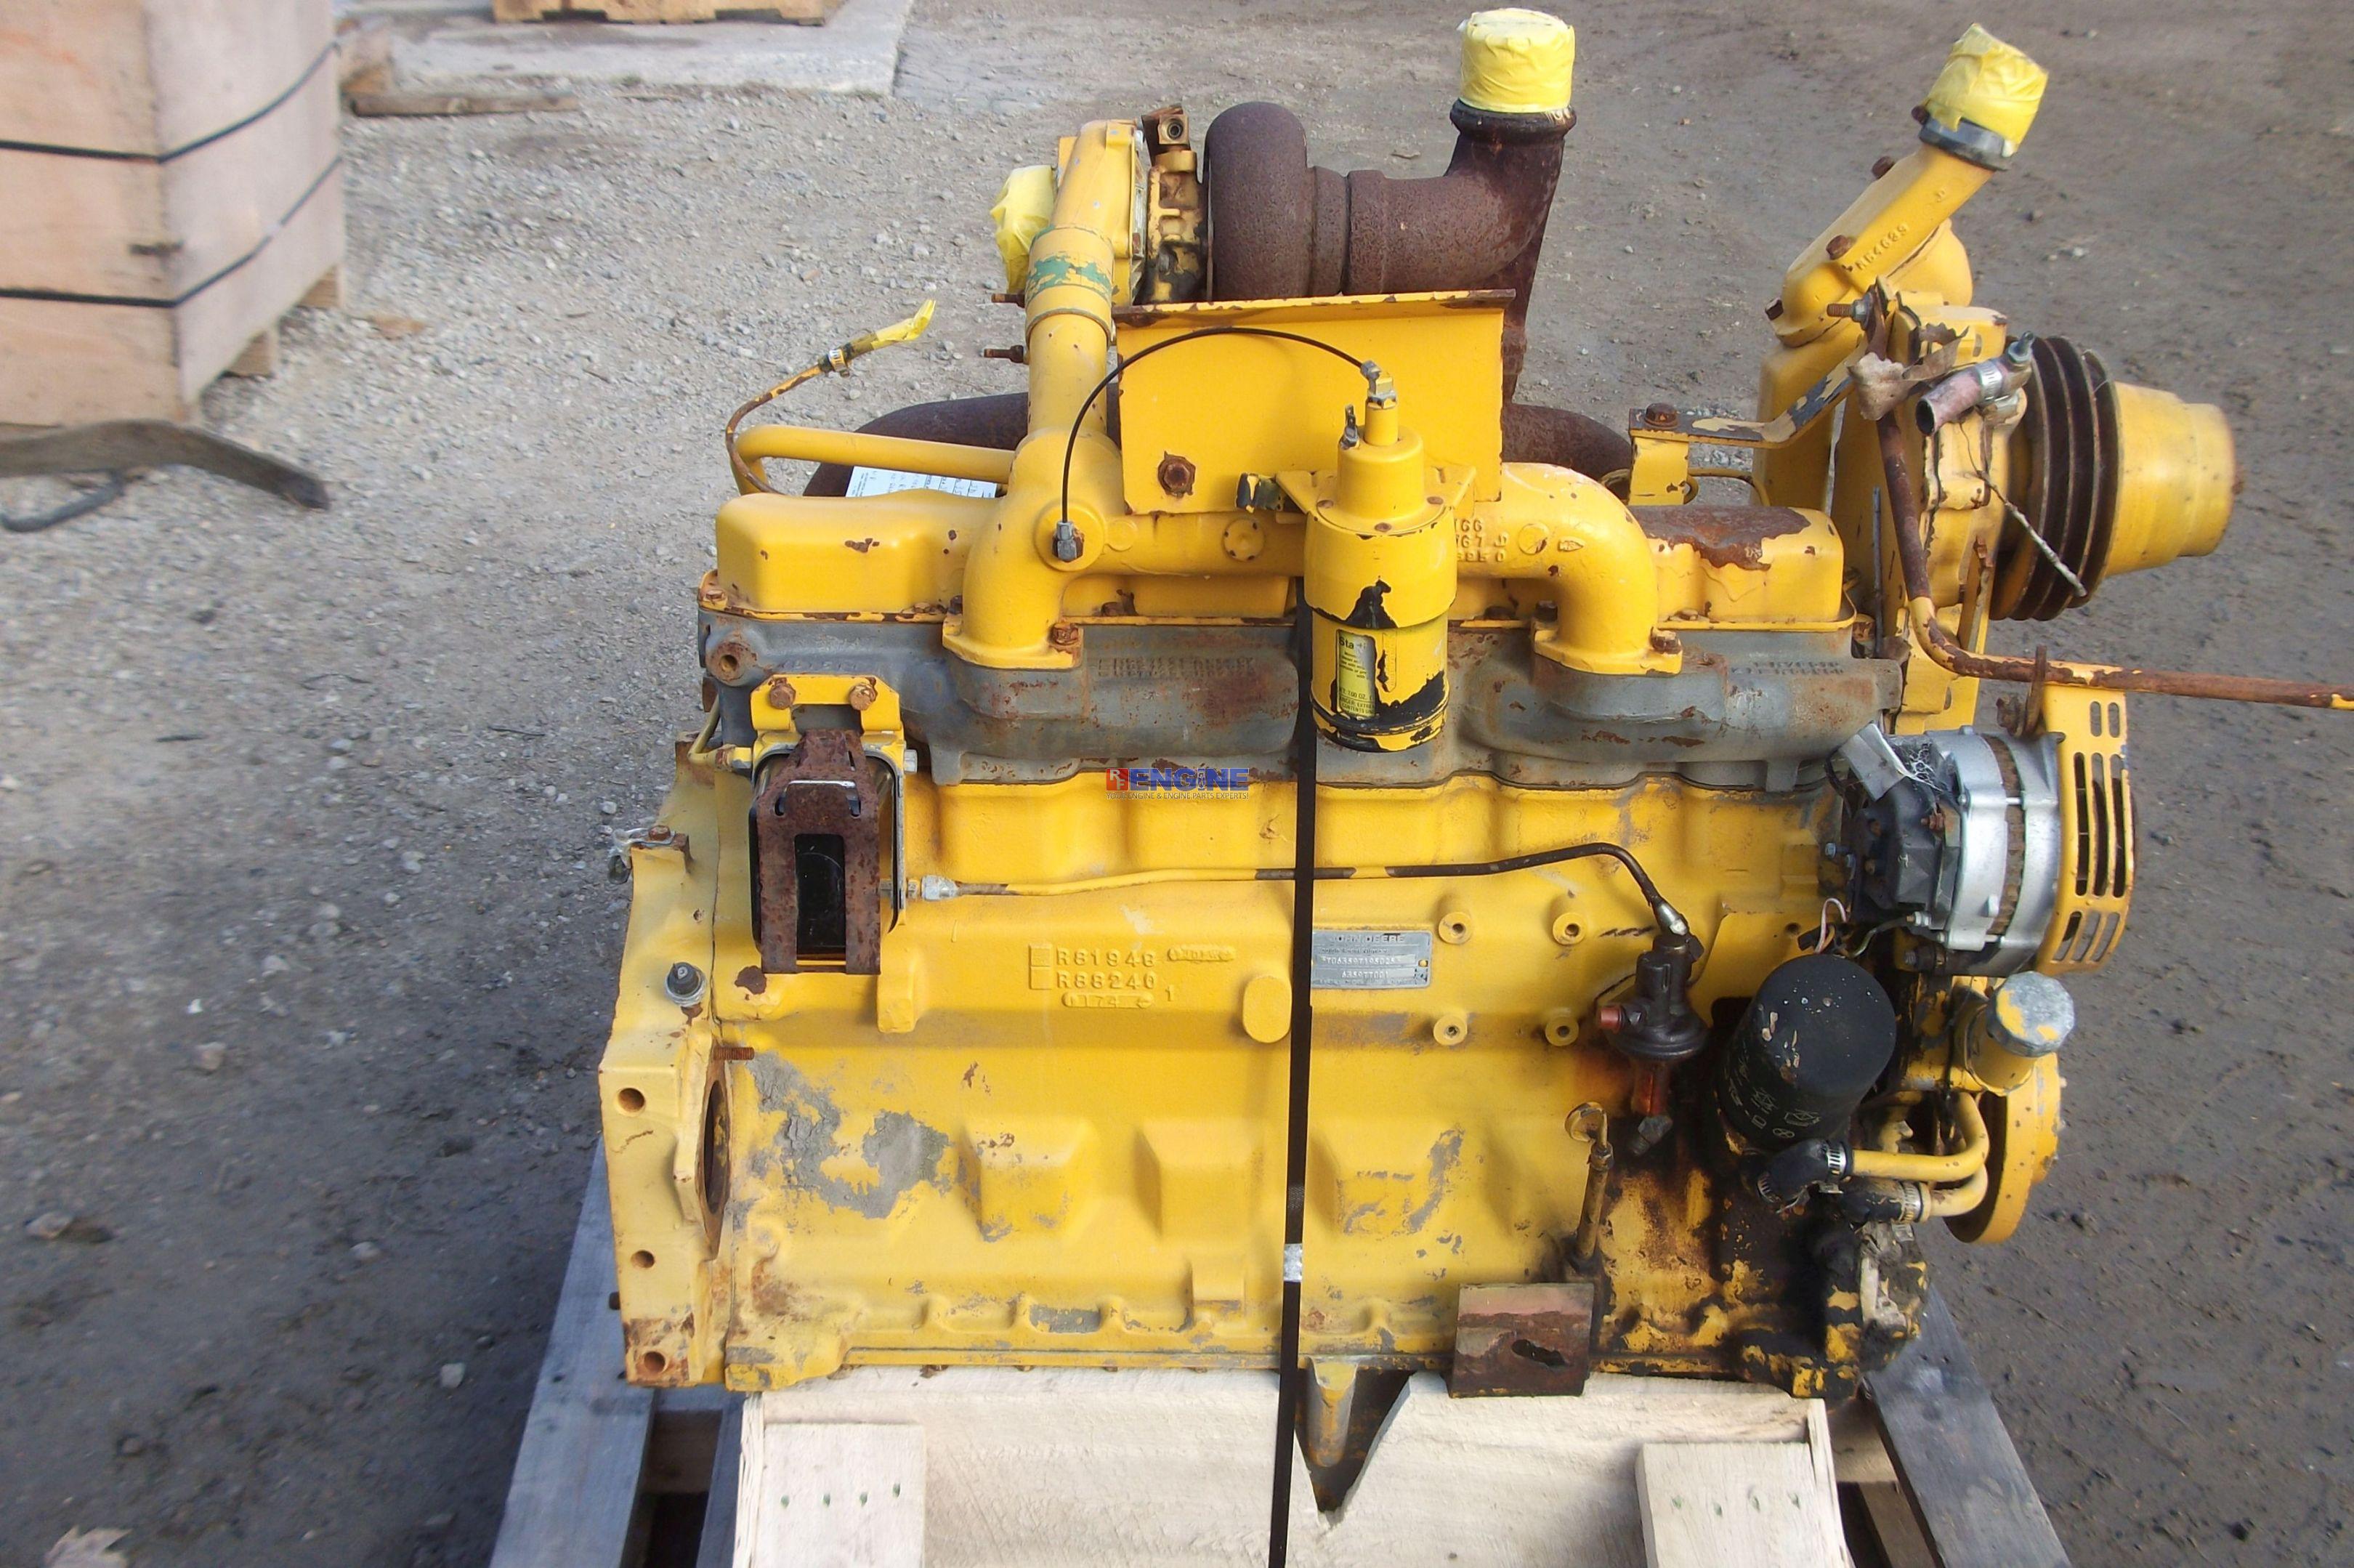 John Deere JD 359T Engine Complete Core ESN TO6359T195025 bcn R81948 HCN R610 | eBay